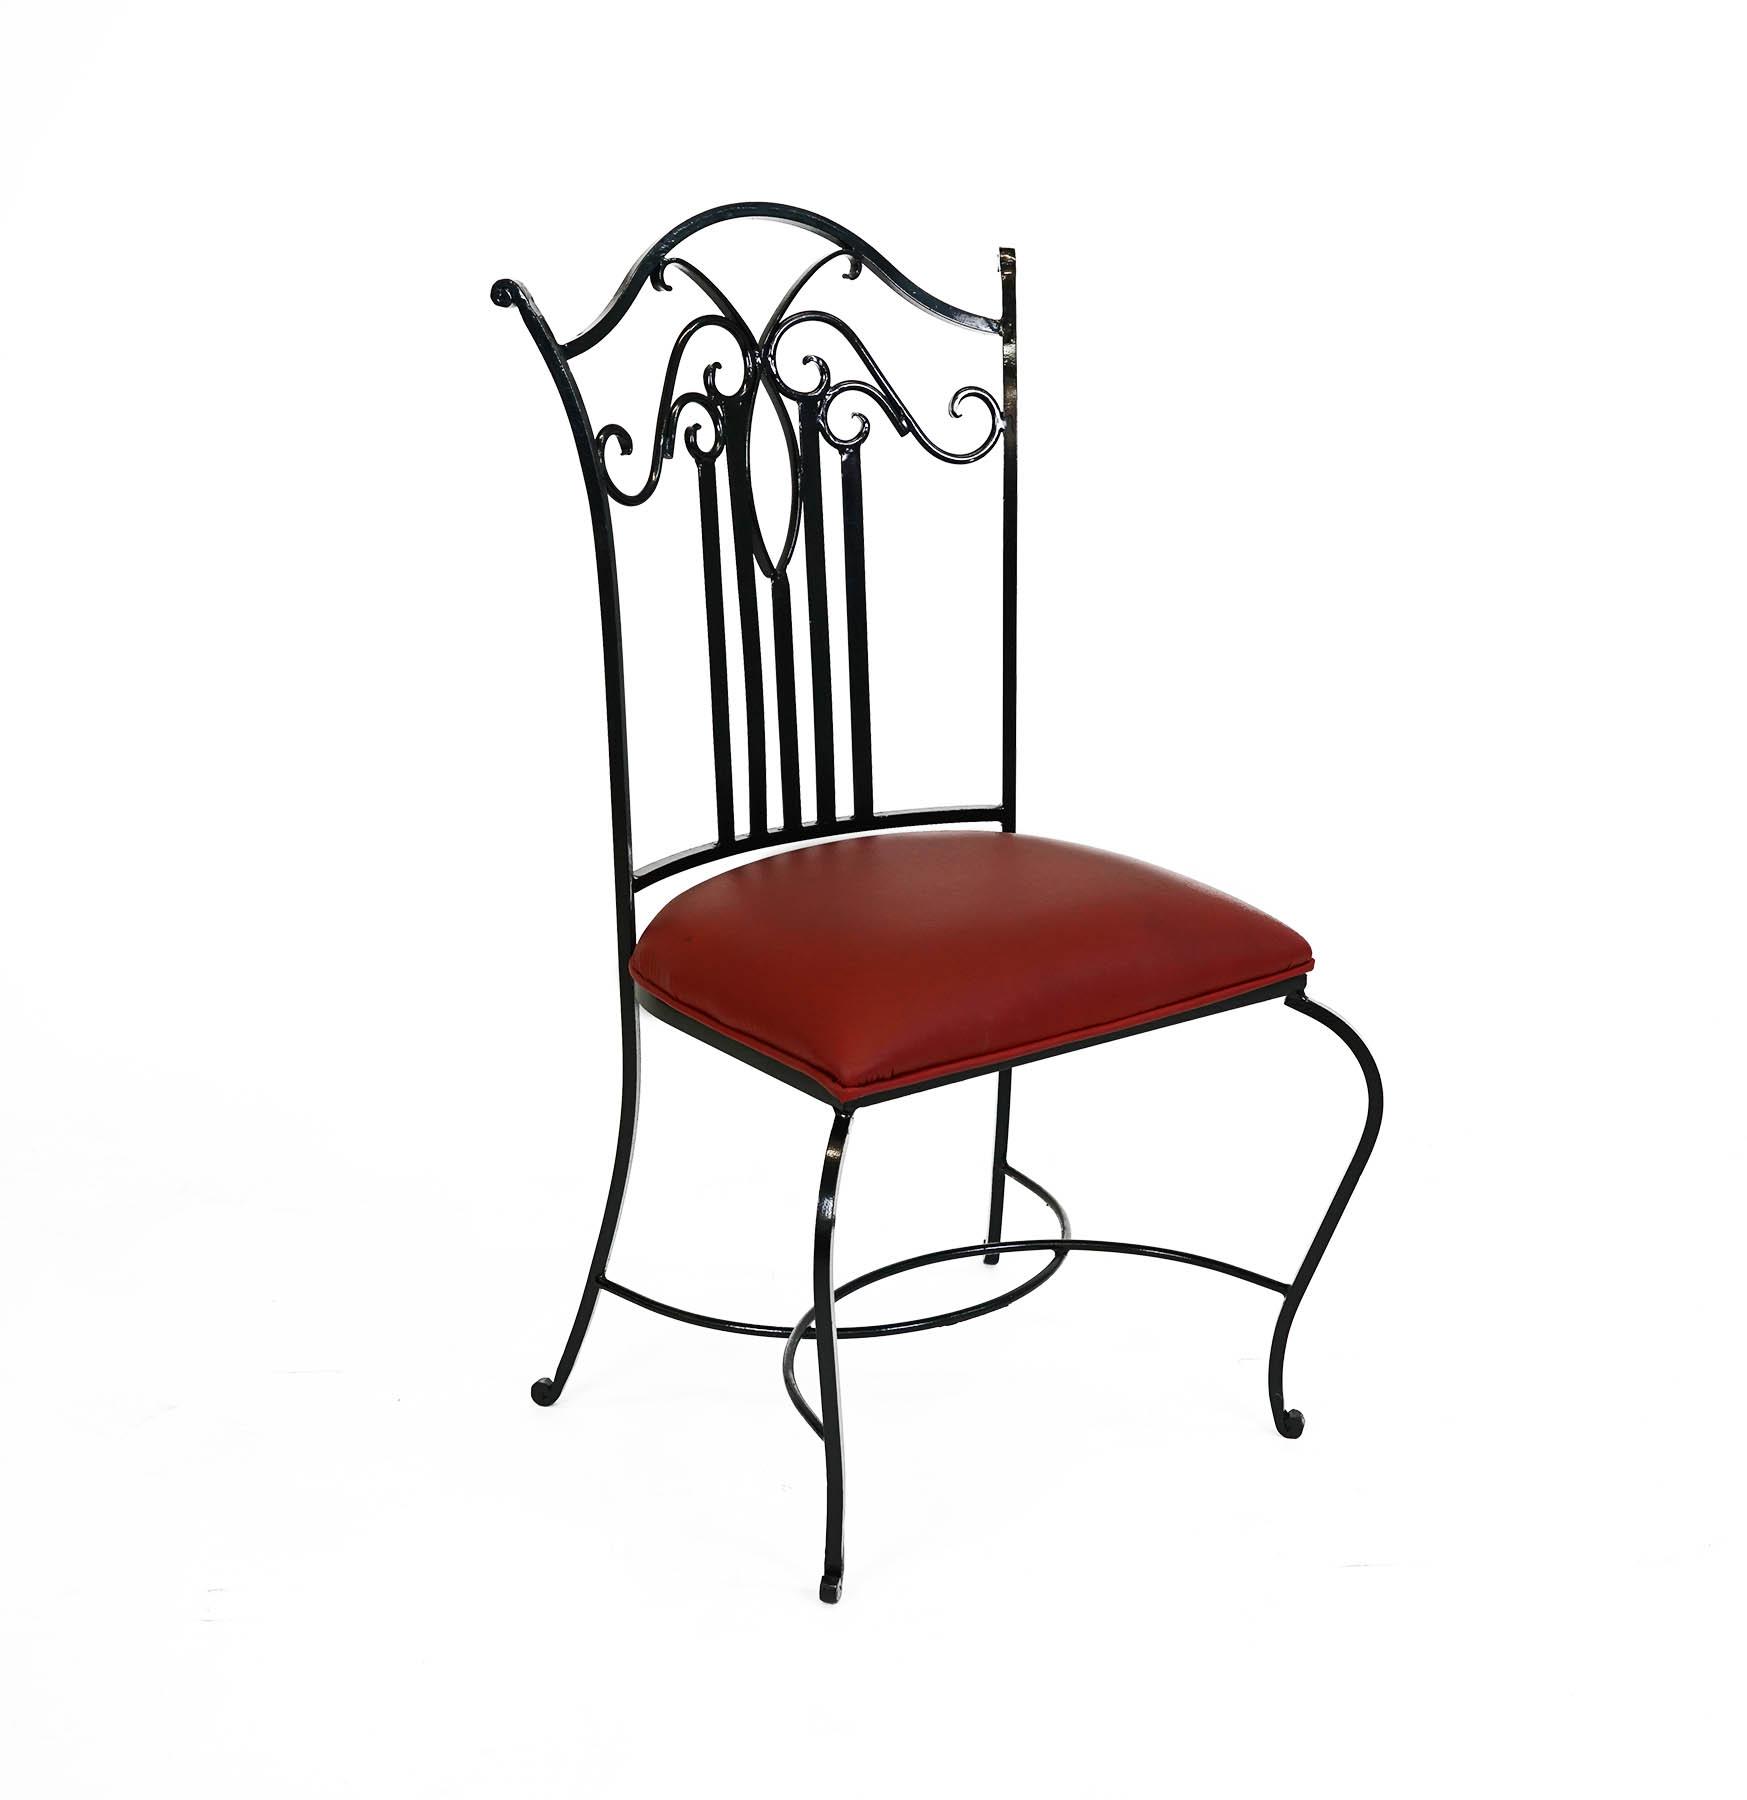 Dream Furniture Catalog Photo 0002.jpg